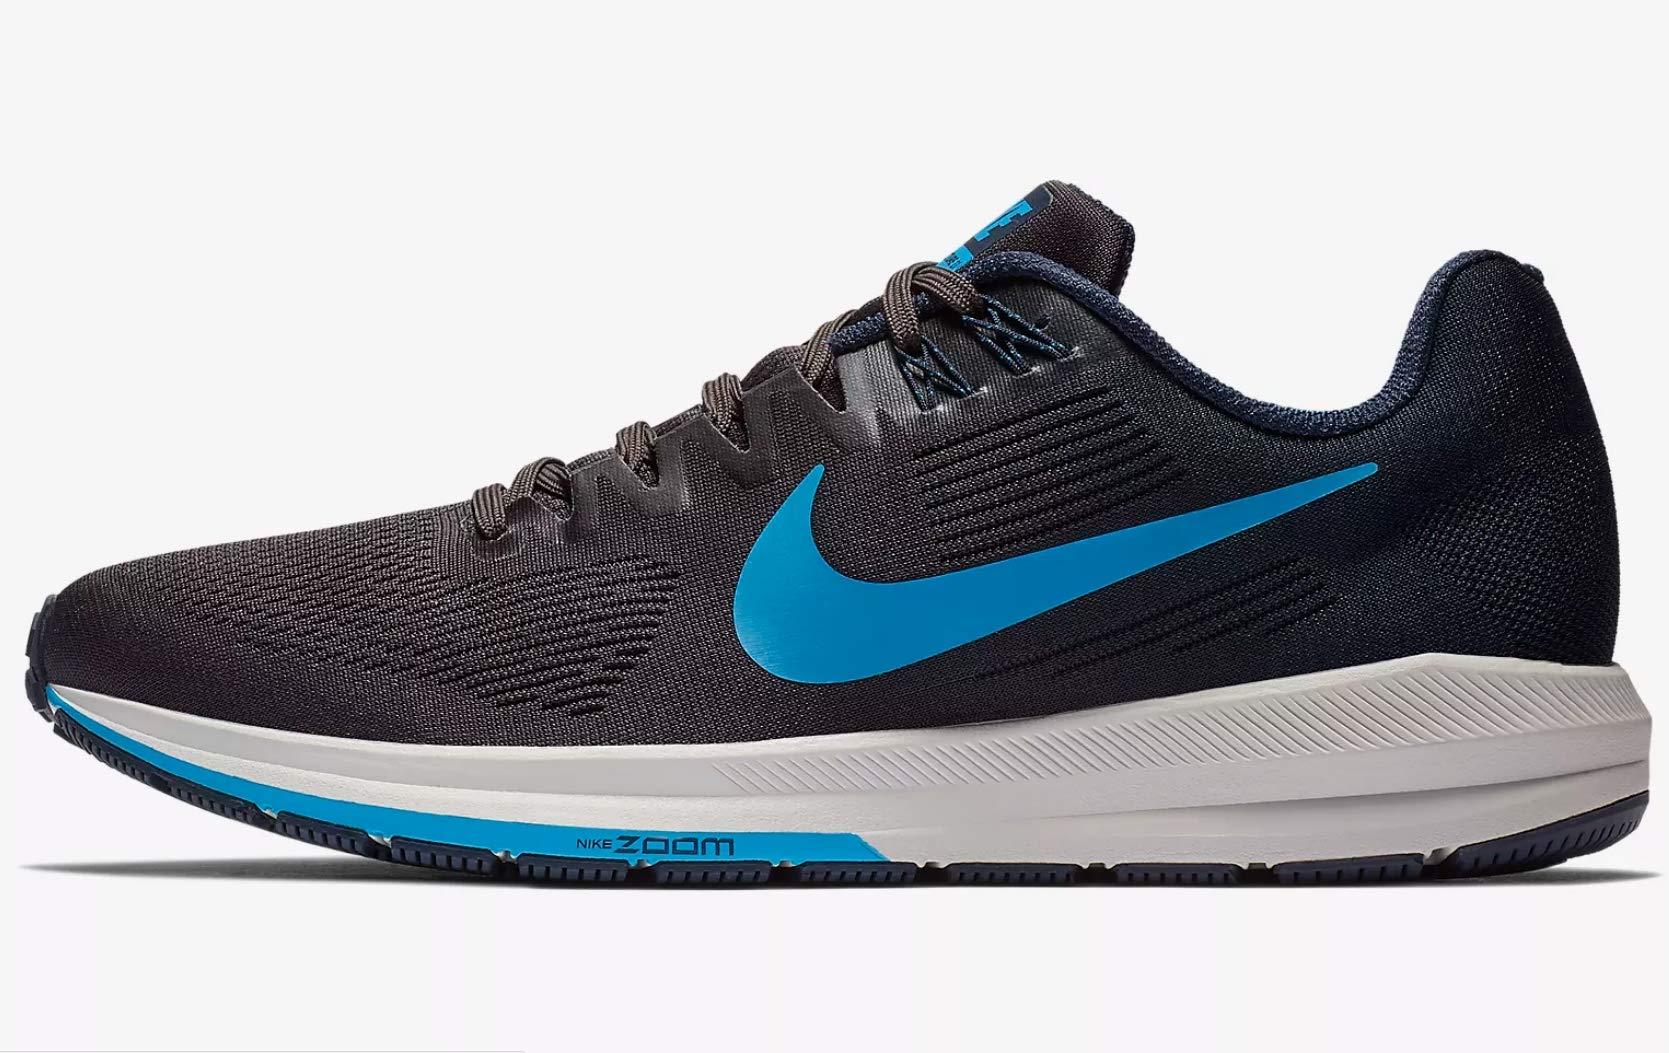 fe9f547b8fae5 Galleon - Nike Men s Air Zoom Structure 21 Running Shoe Obsidian Blue Hero- Thunder Grey 7.5